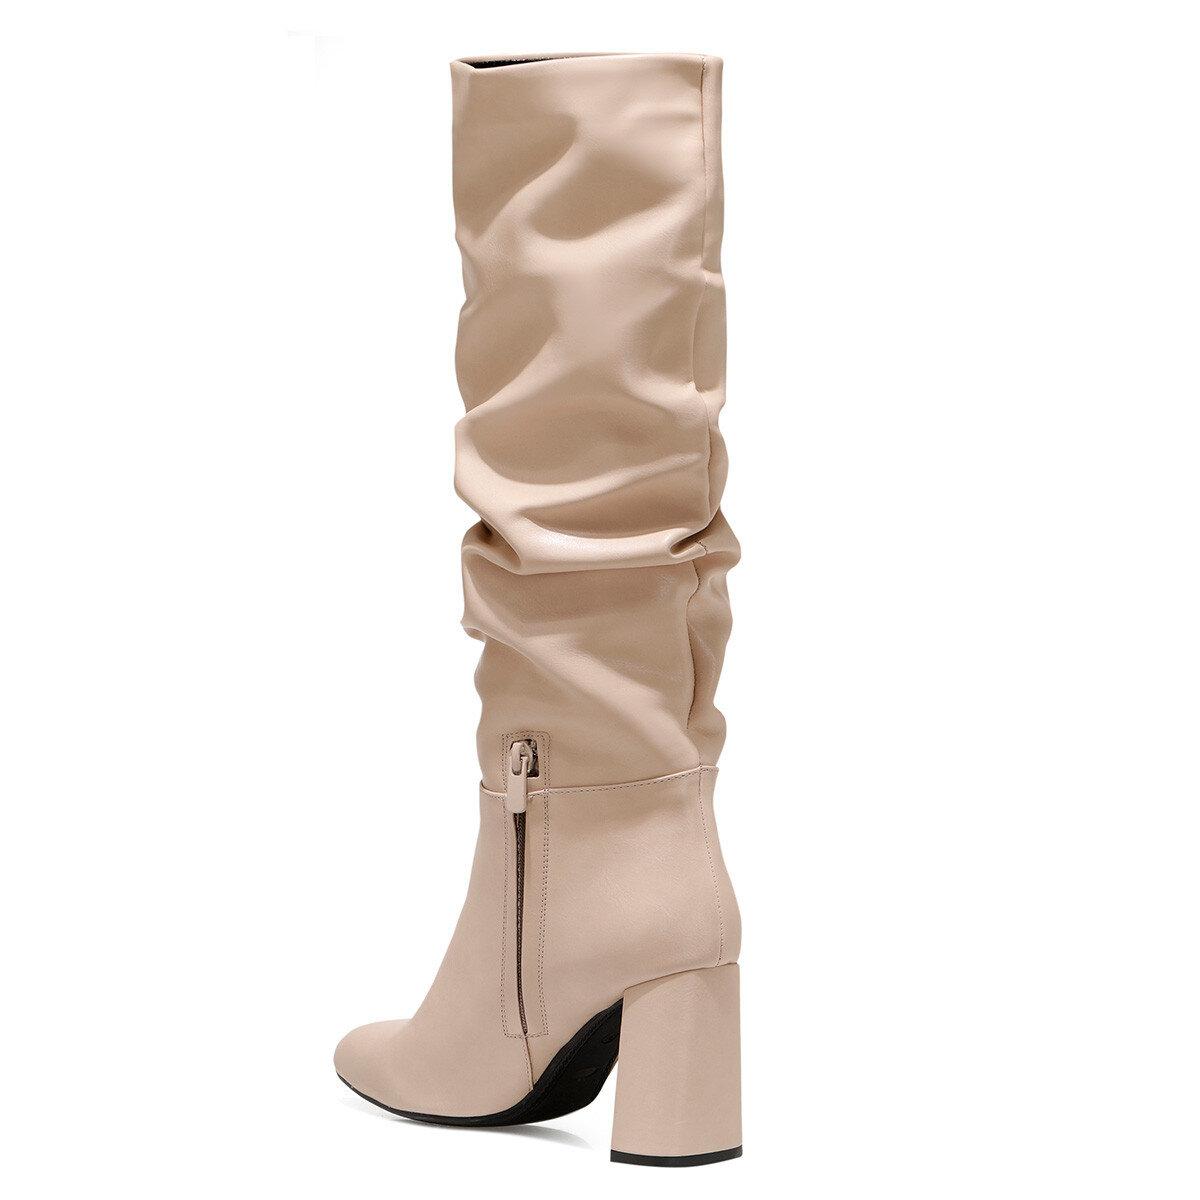 SORAMA Pudra Kadın Topuklu Çizme